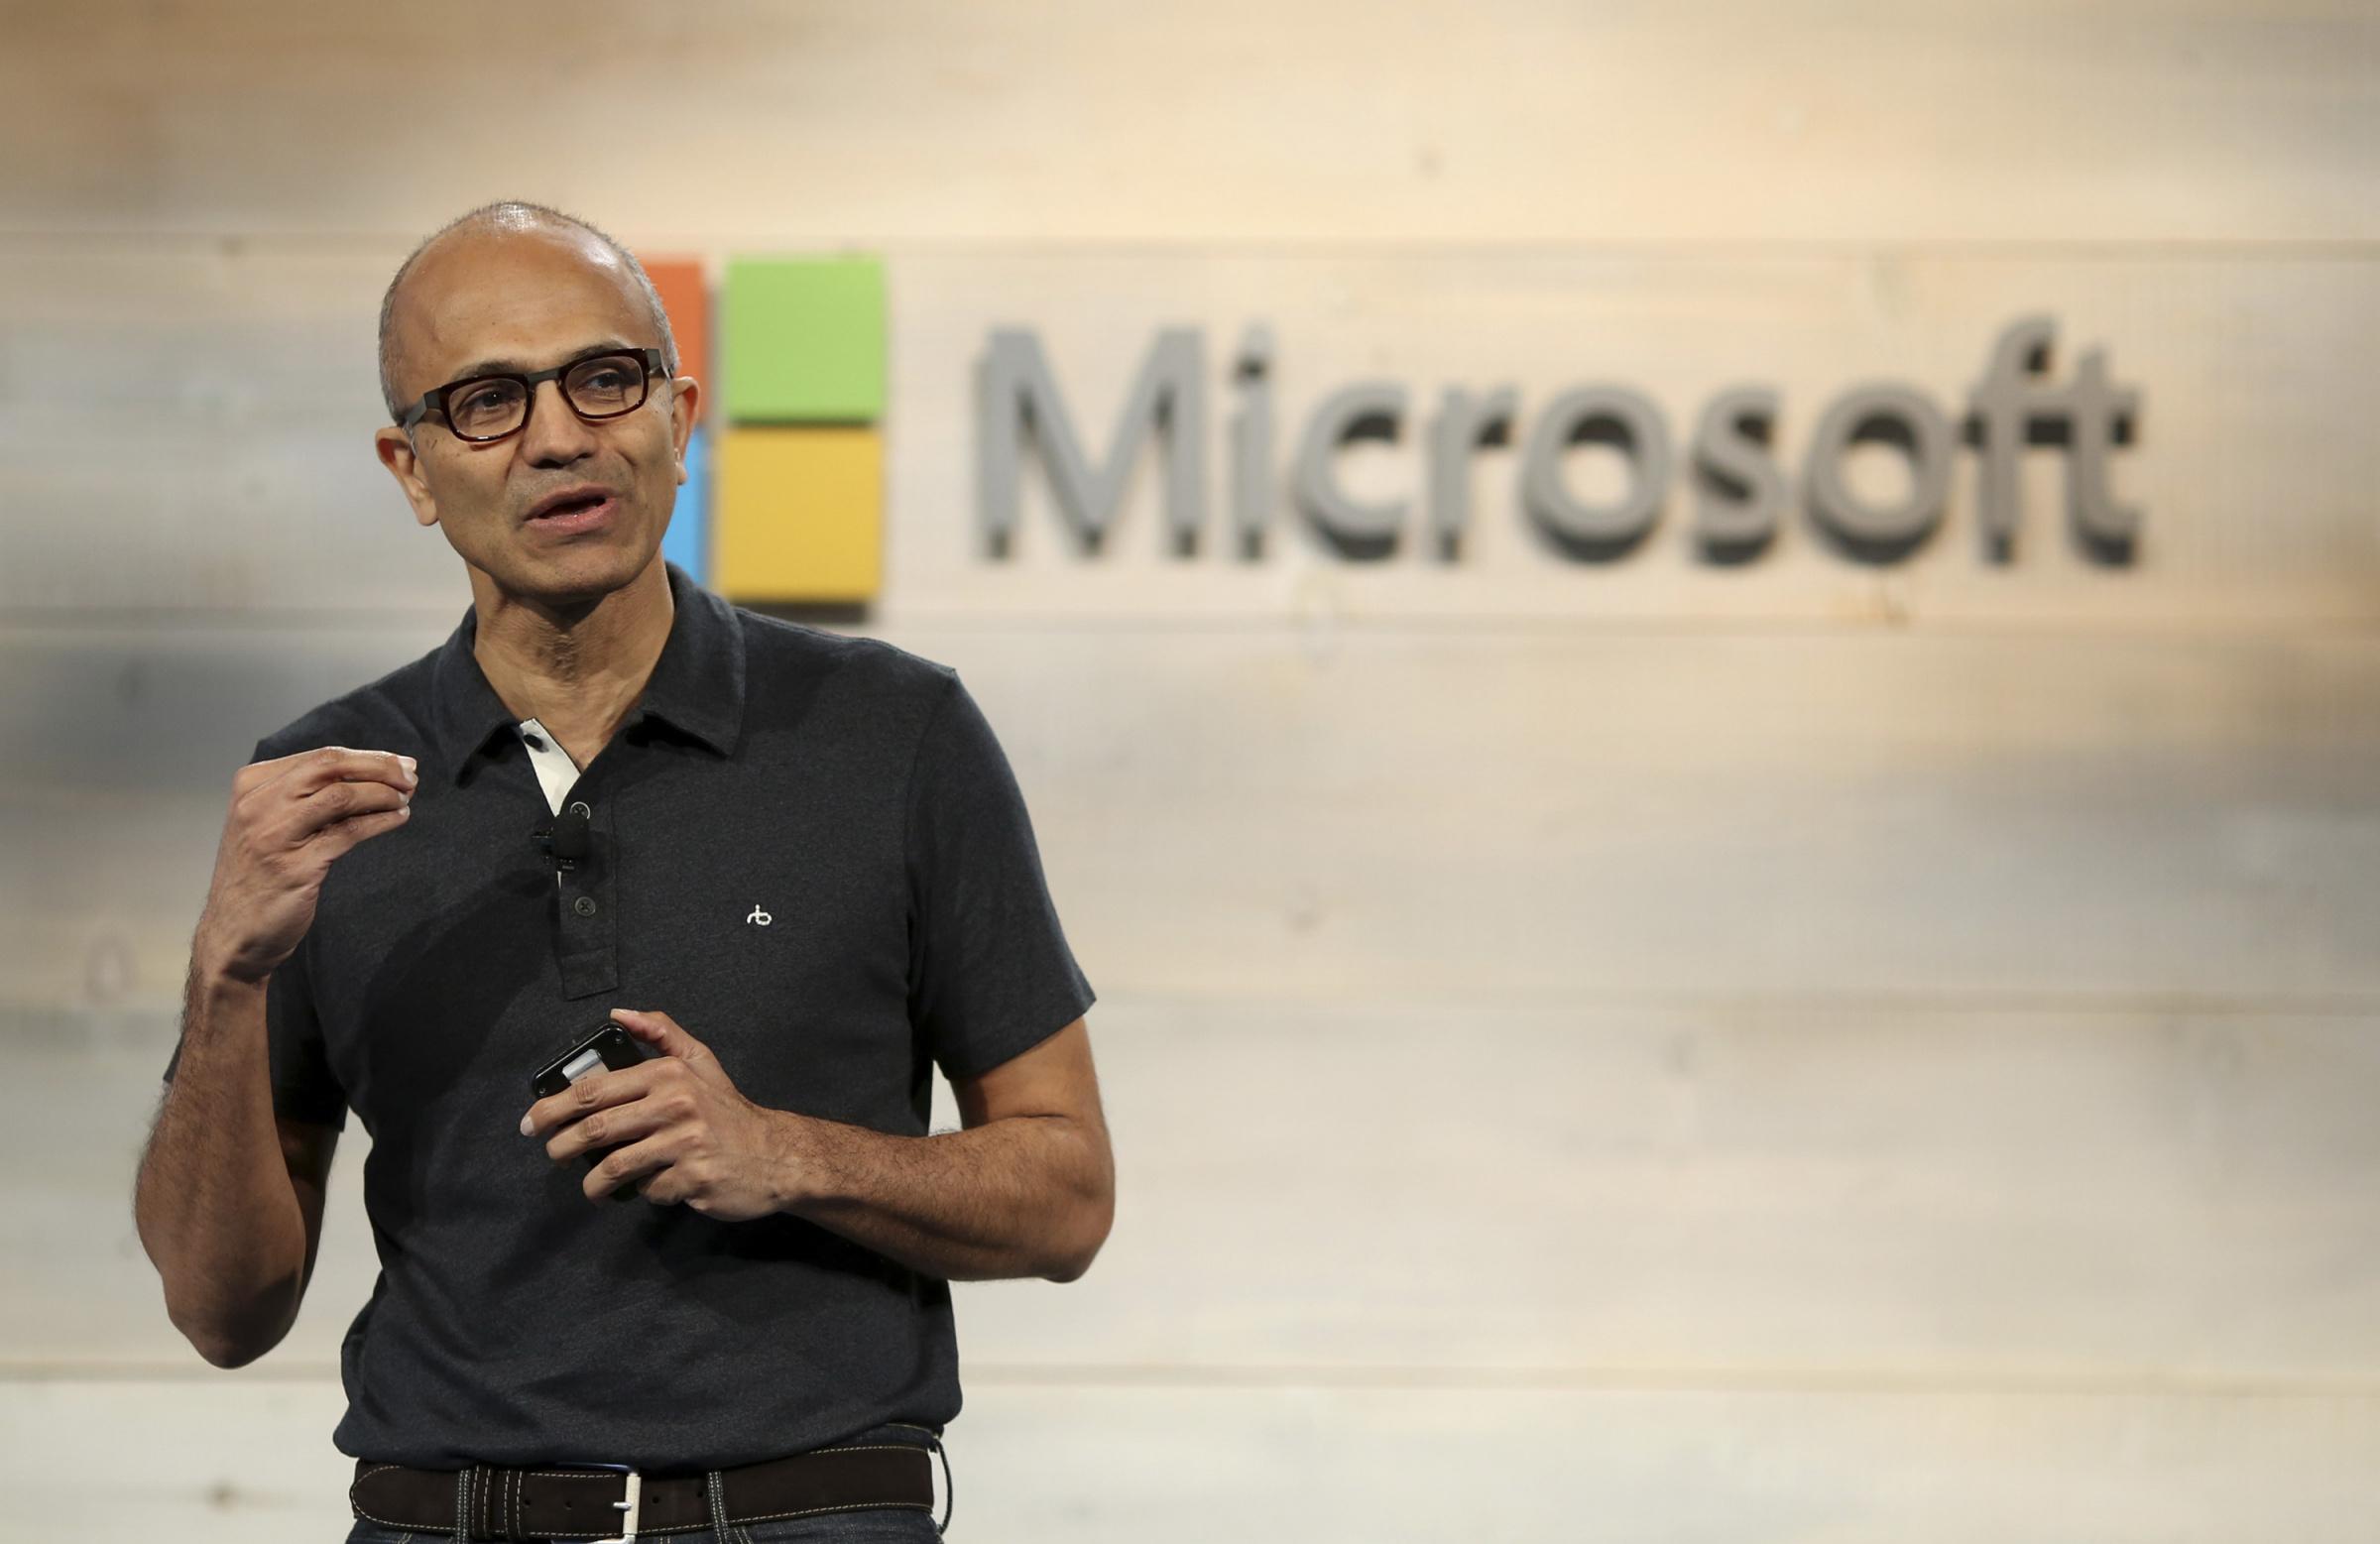 Majandus.ee: Microsofti juht Satya Nadella Foto: REUTERS/Robert Galbraith